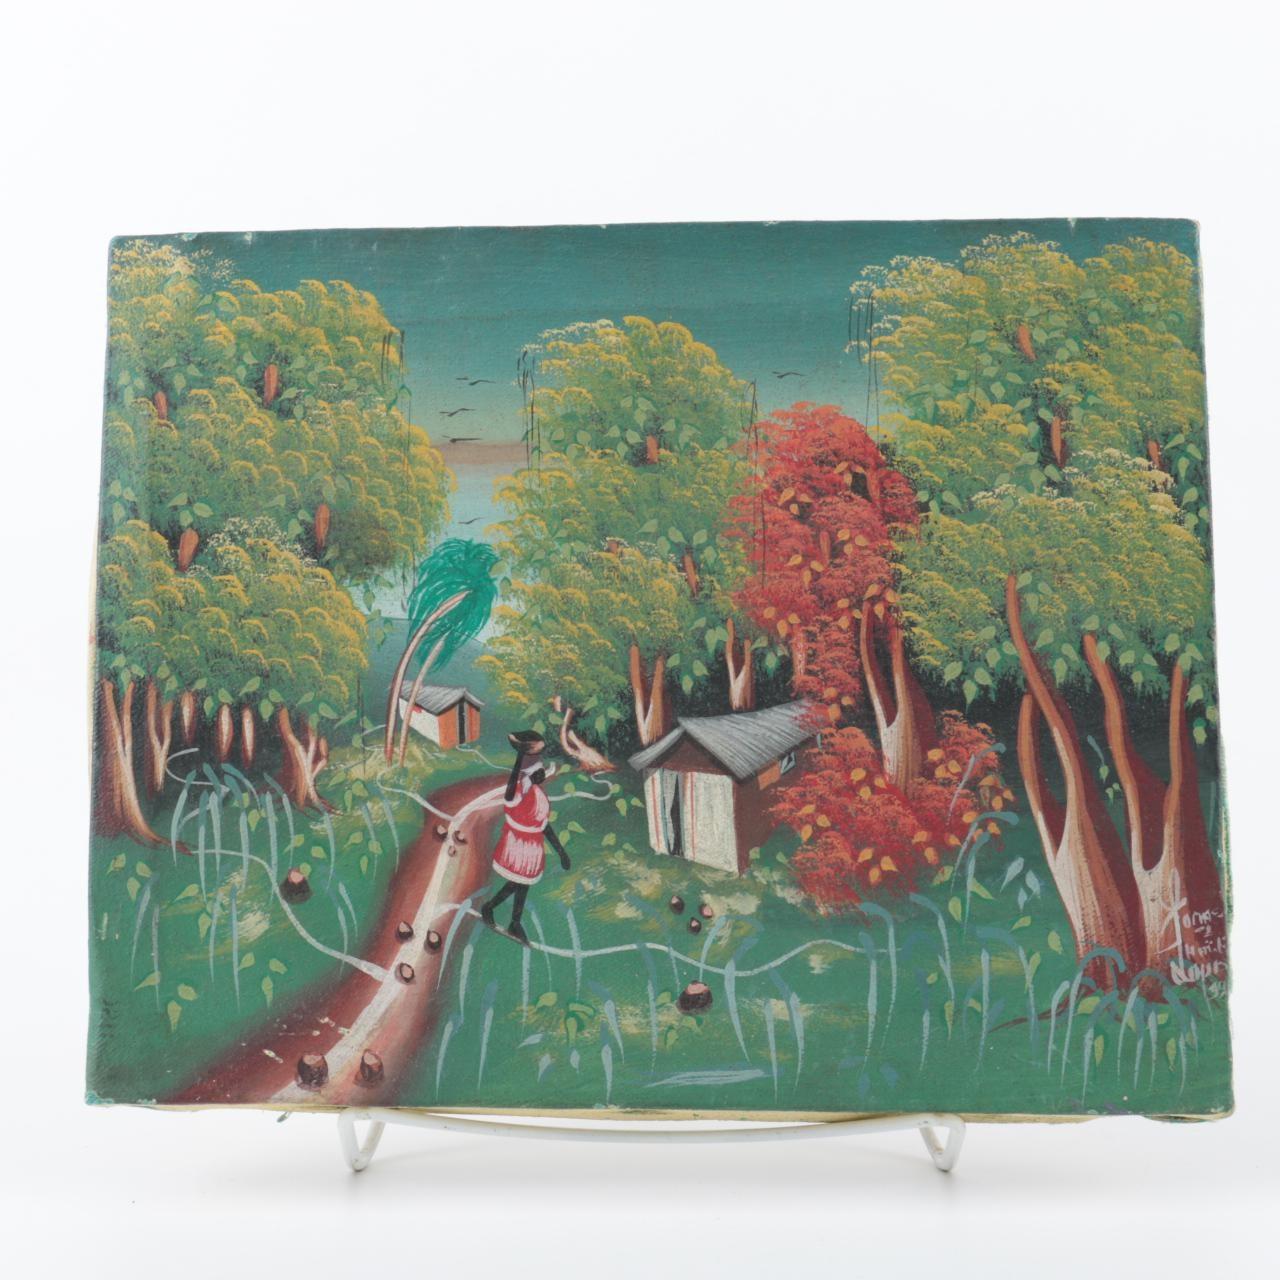 Original Oil Painting on Canvas Jungle Scene